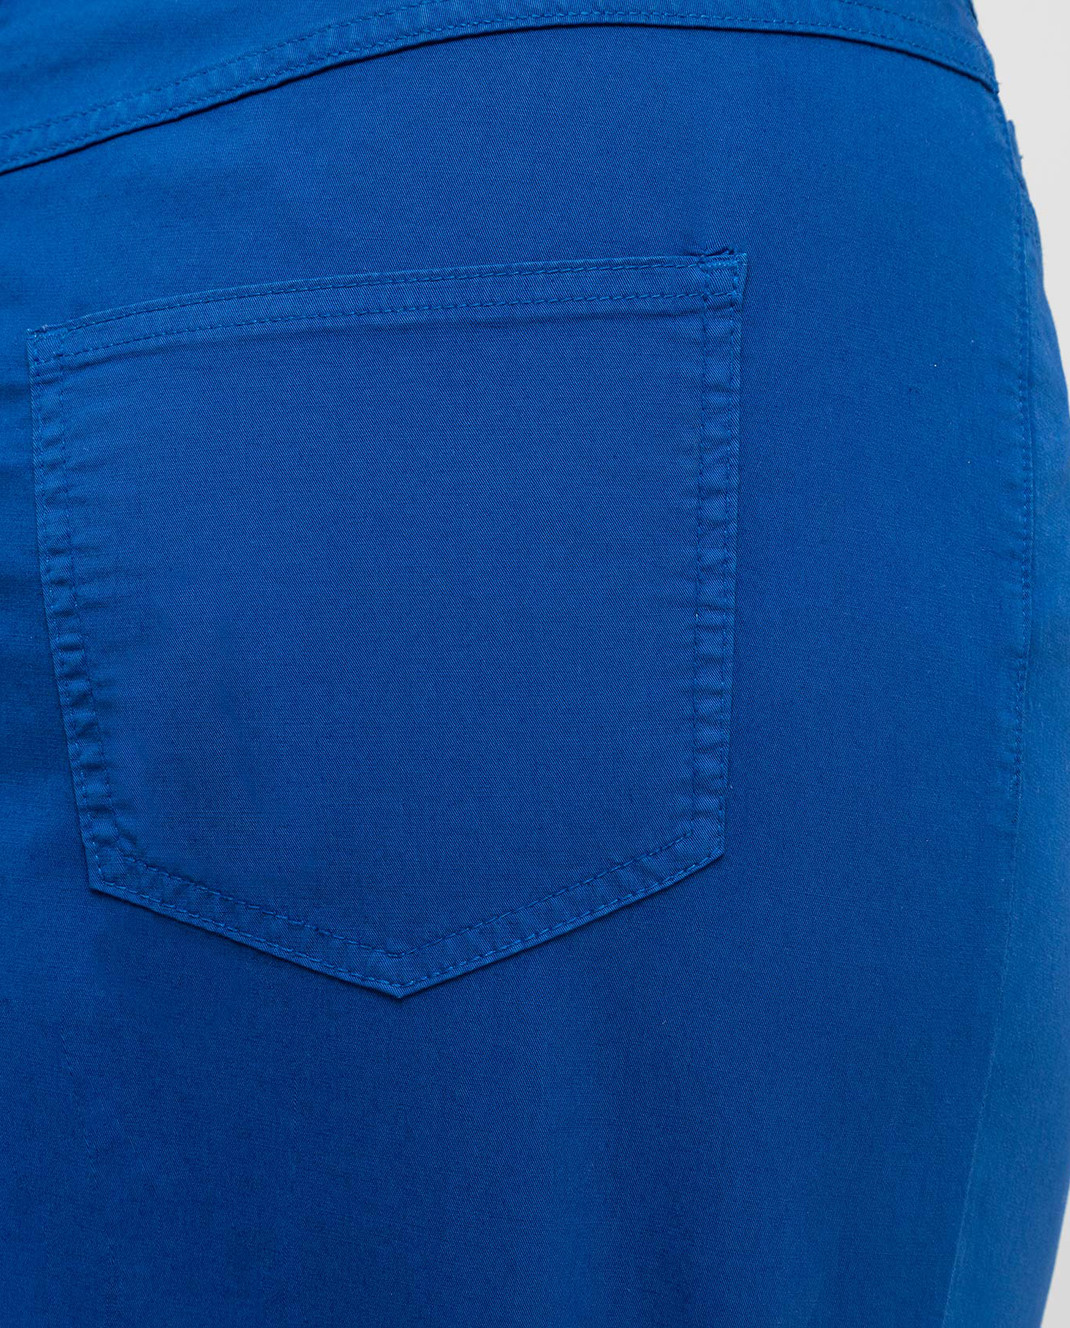 Marina Sport by Marina Rinaldi Темно-синяя джинсовая юбка CAROTENE изображение 5